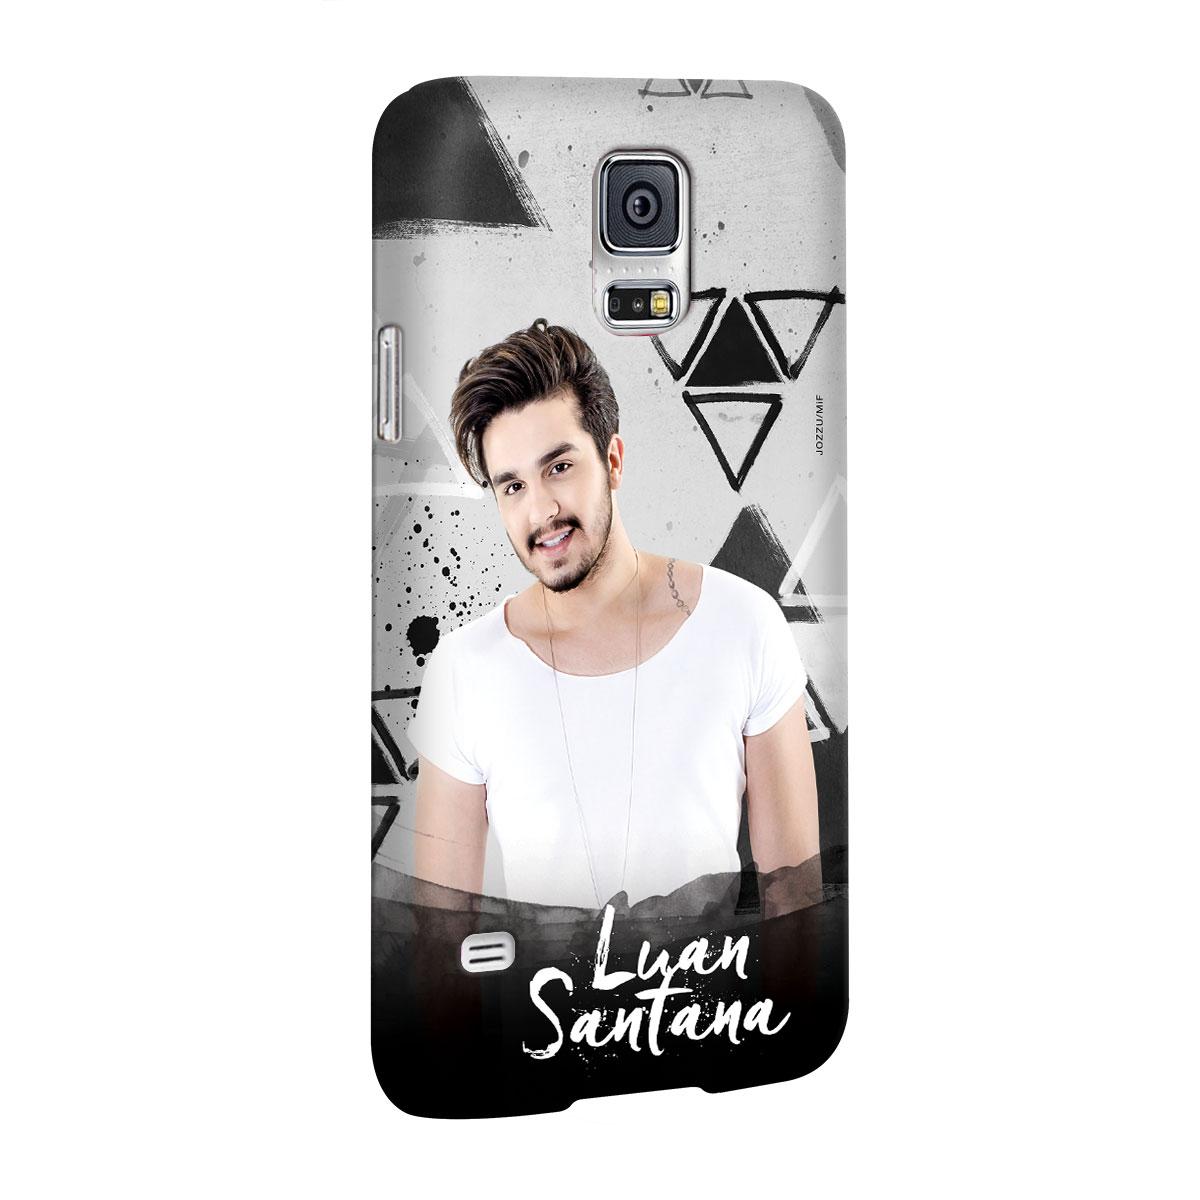 Capa para Samsung Galaxy S5 Luan Santana Picture